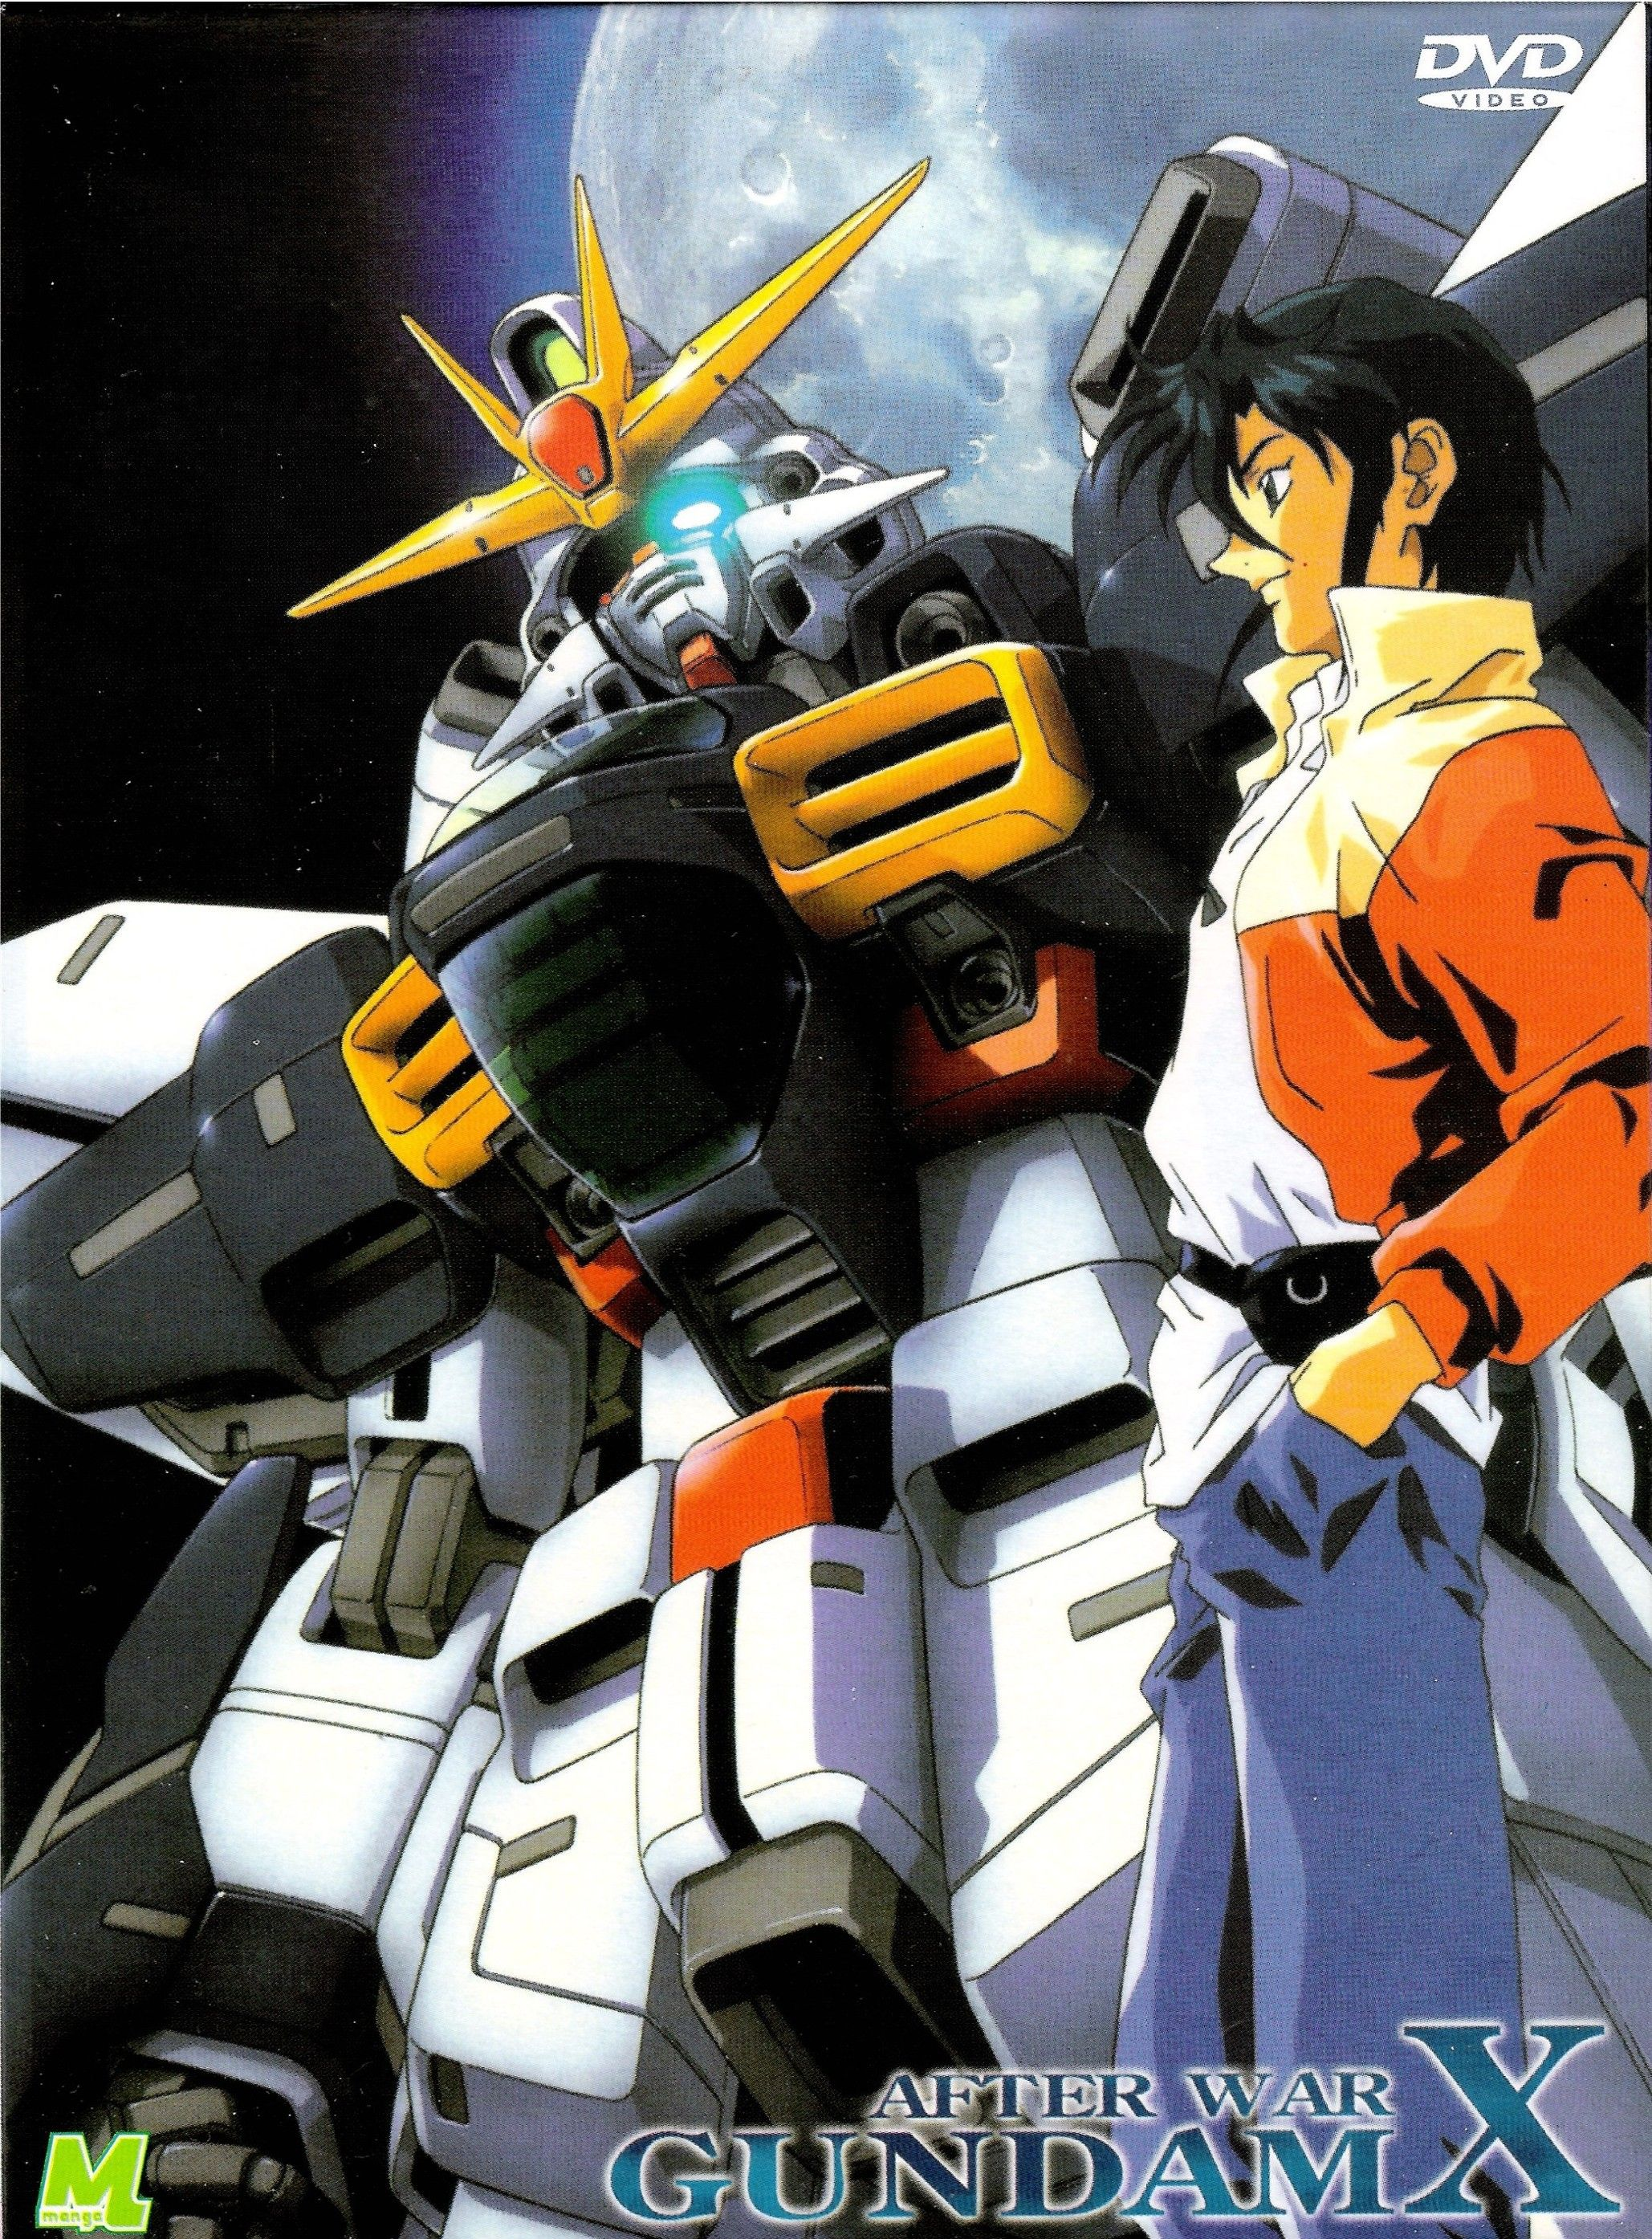 Garrod Ran Gundam, Anime, Gundam art